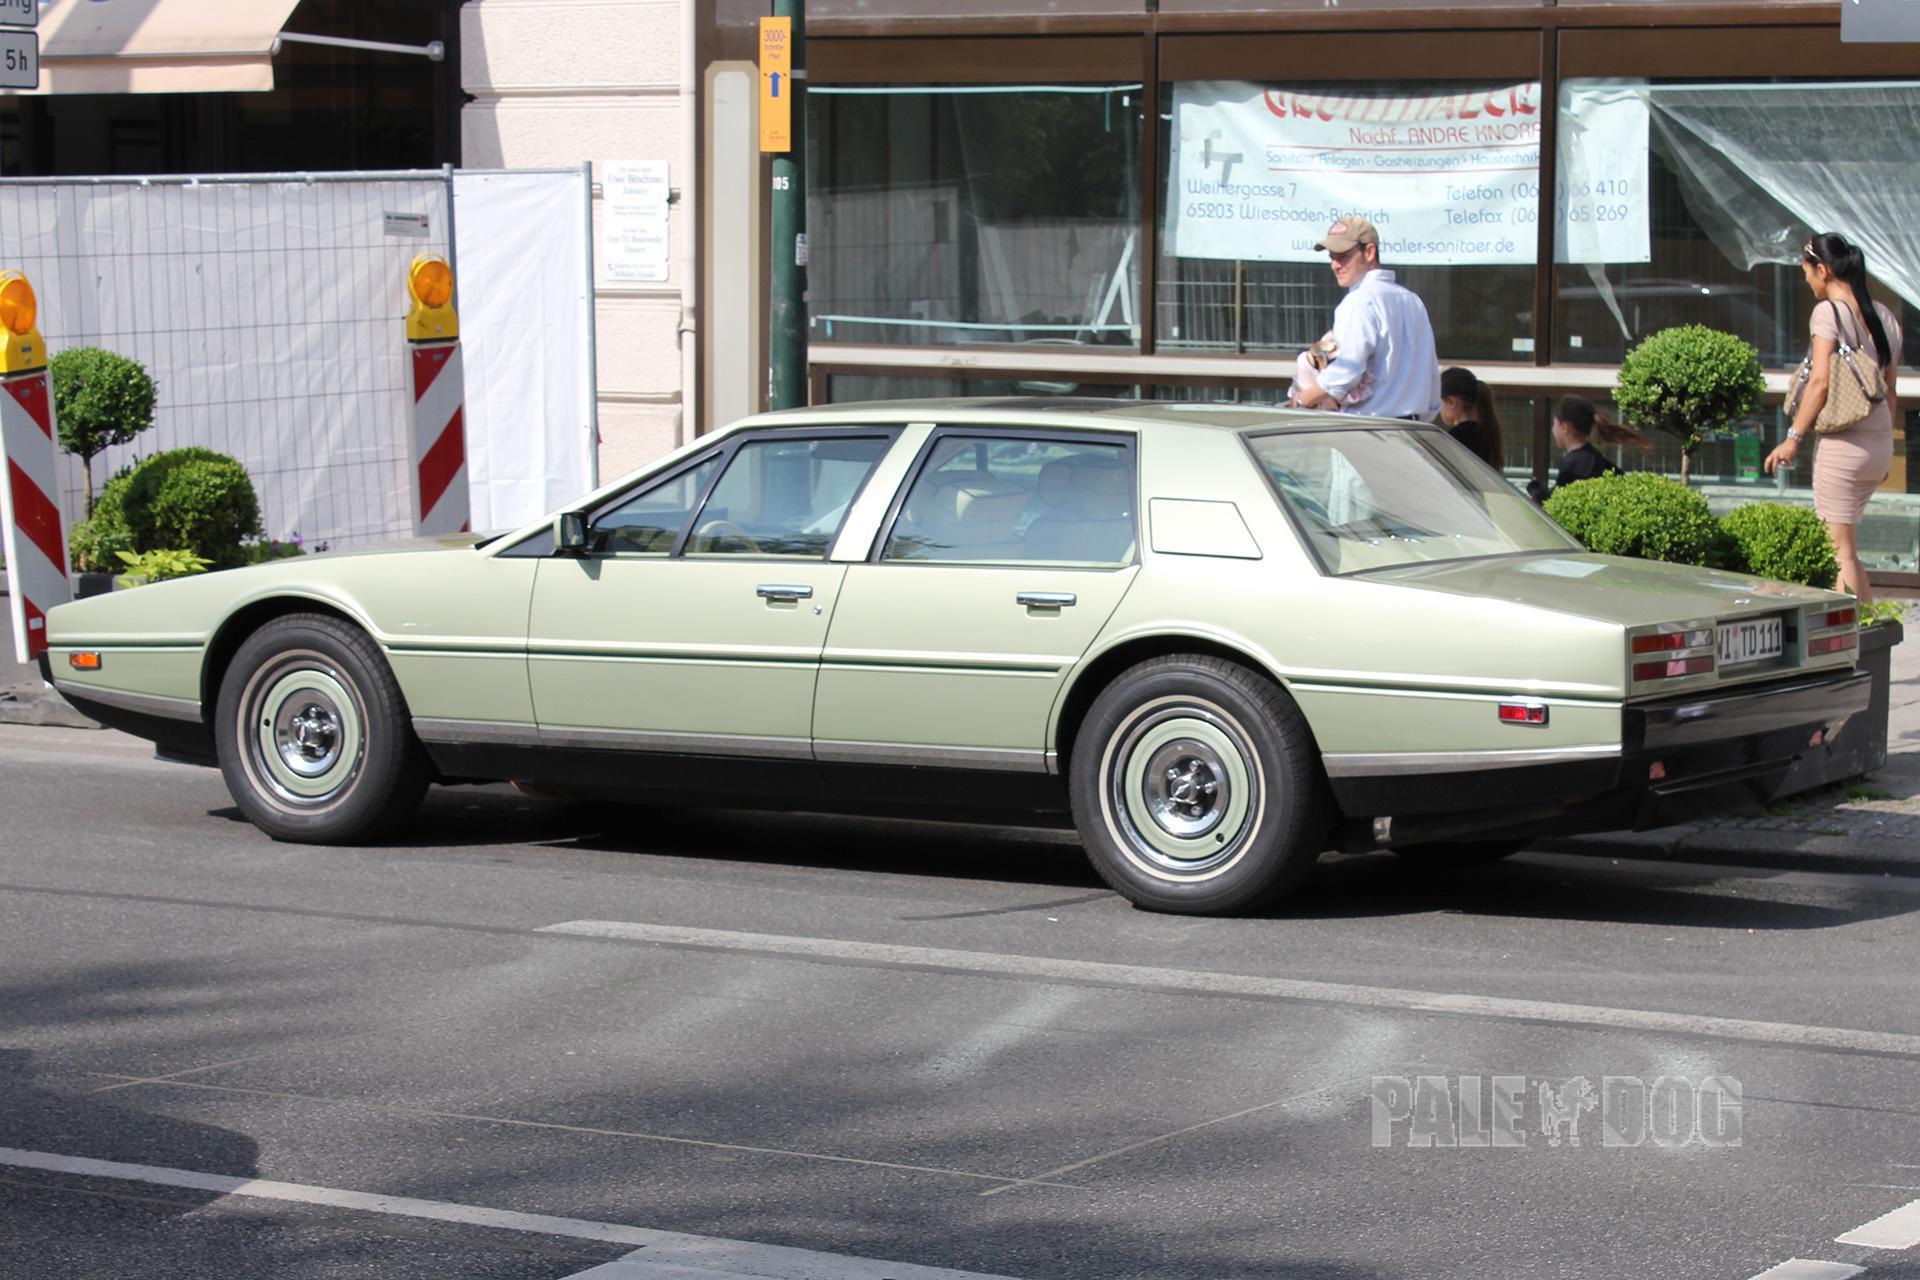 1983 Aston Martin Lagonda Rear View 1980s Paledog Photo Collection